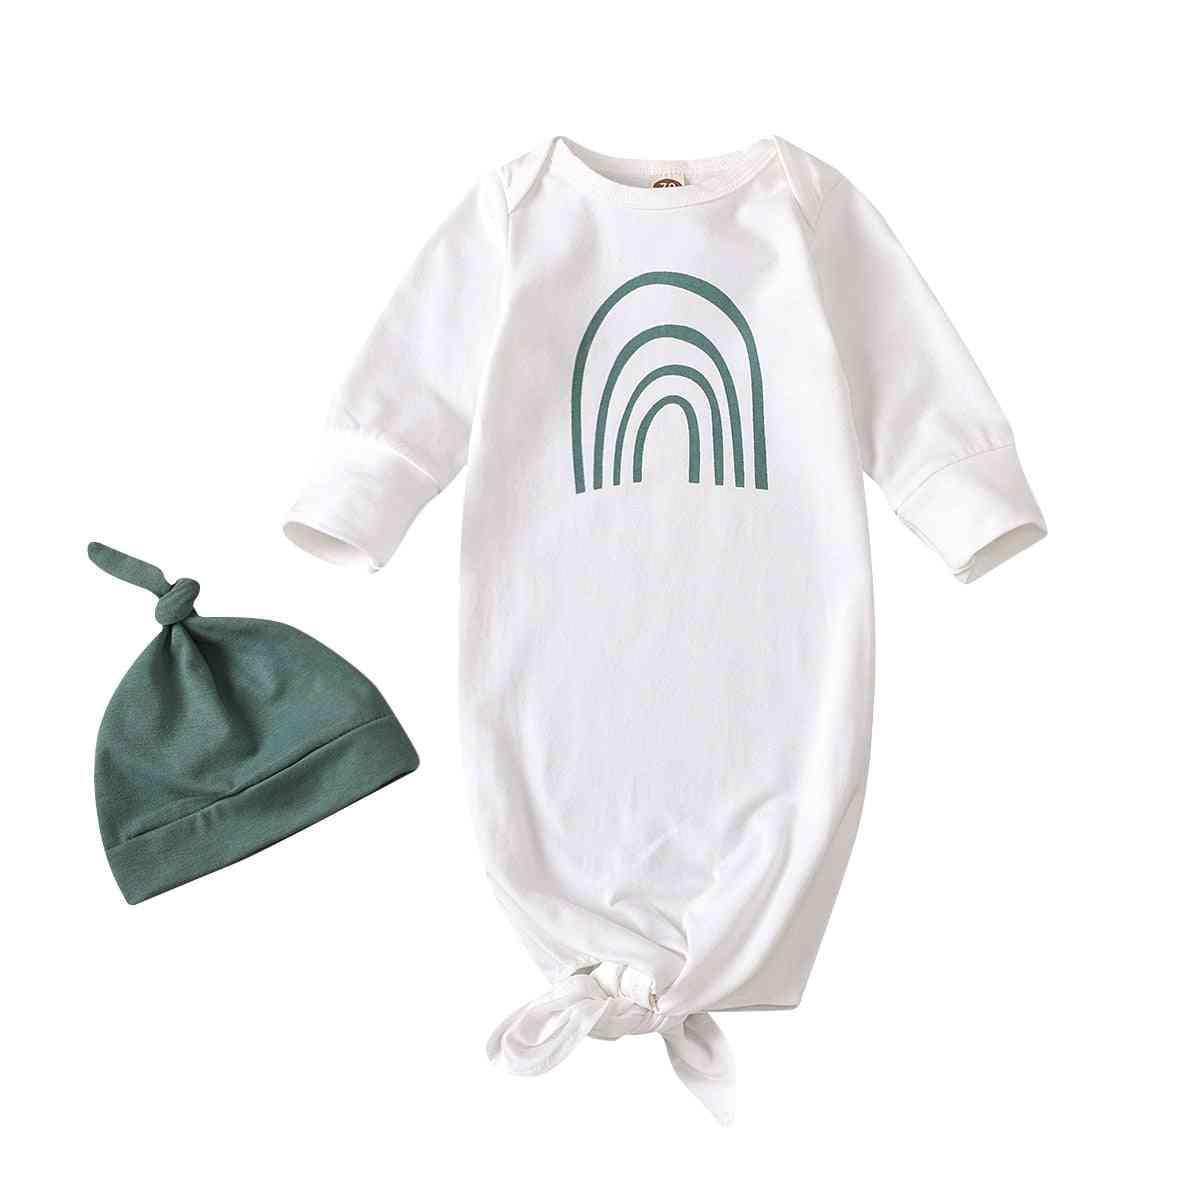 Newborn Infant Baby Sleeping Bags Blanket Swaddle